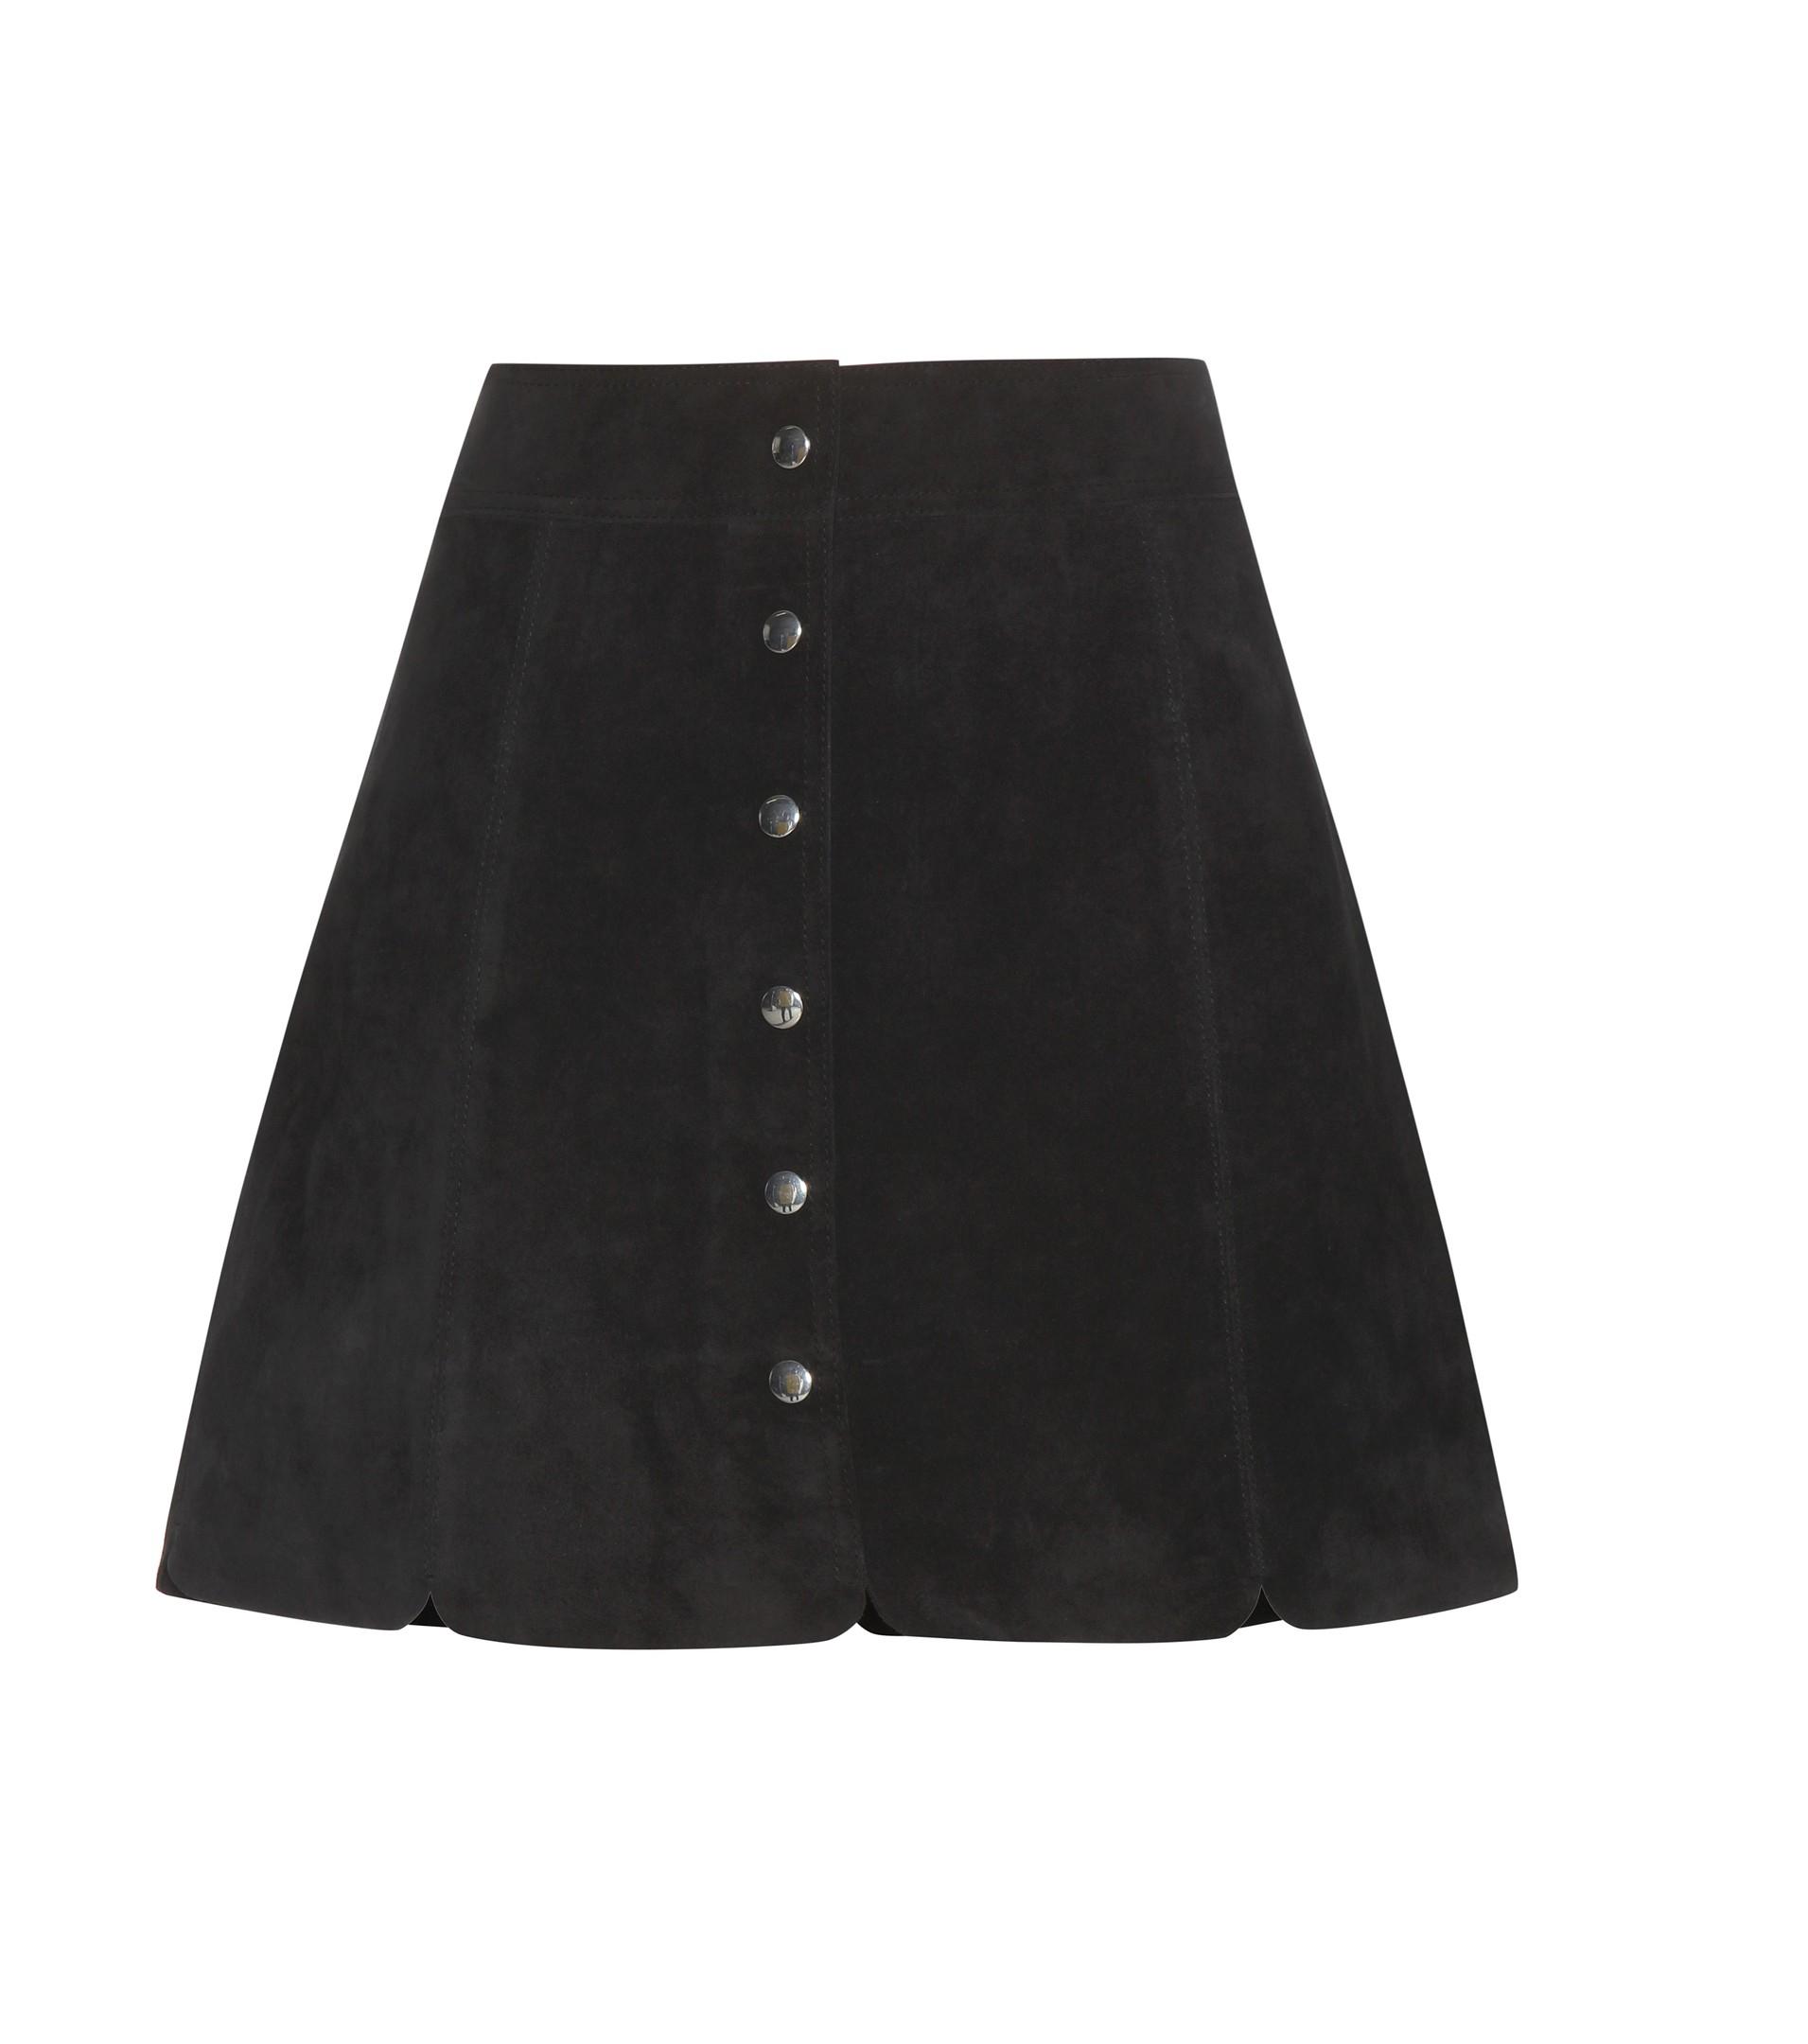 a81dda7cb9 Étoile Isabel Marant Anna Suede Miniskirt in Black - Lyst